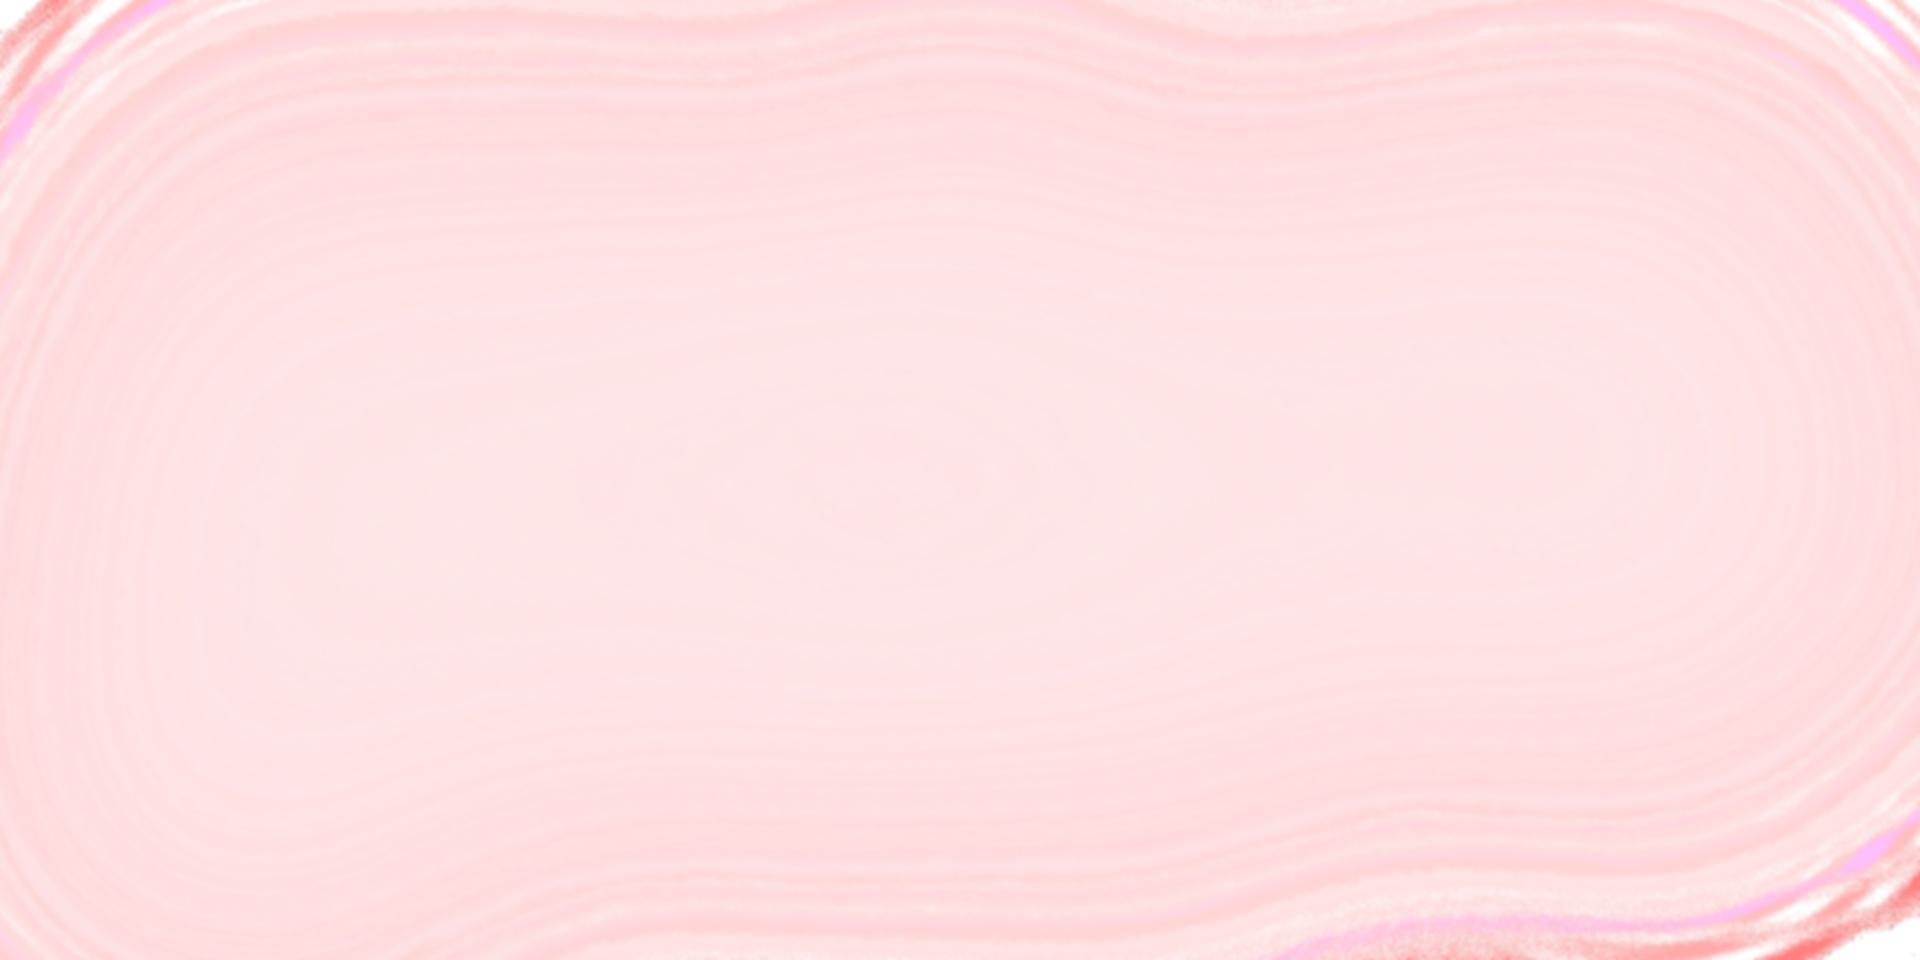 pink%20haze_edited.png